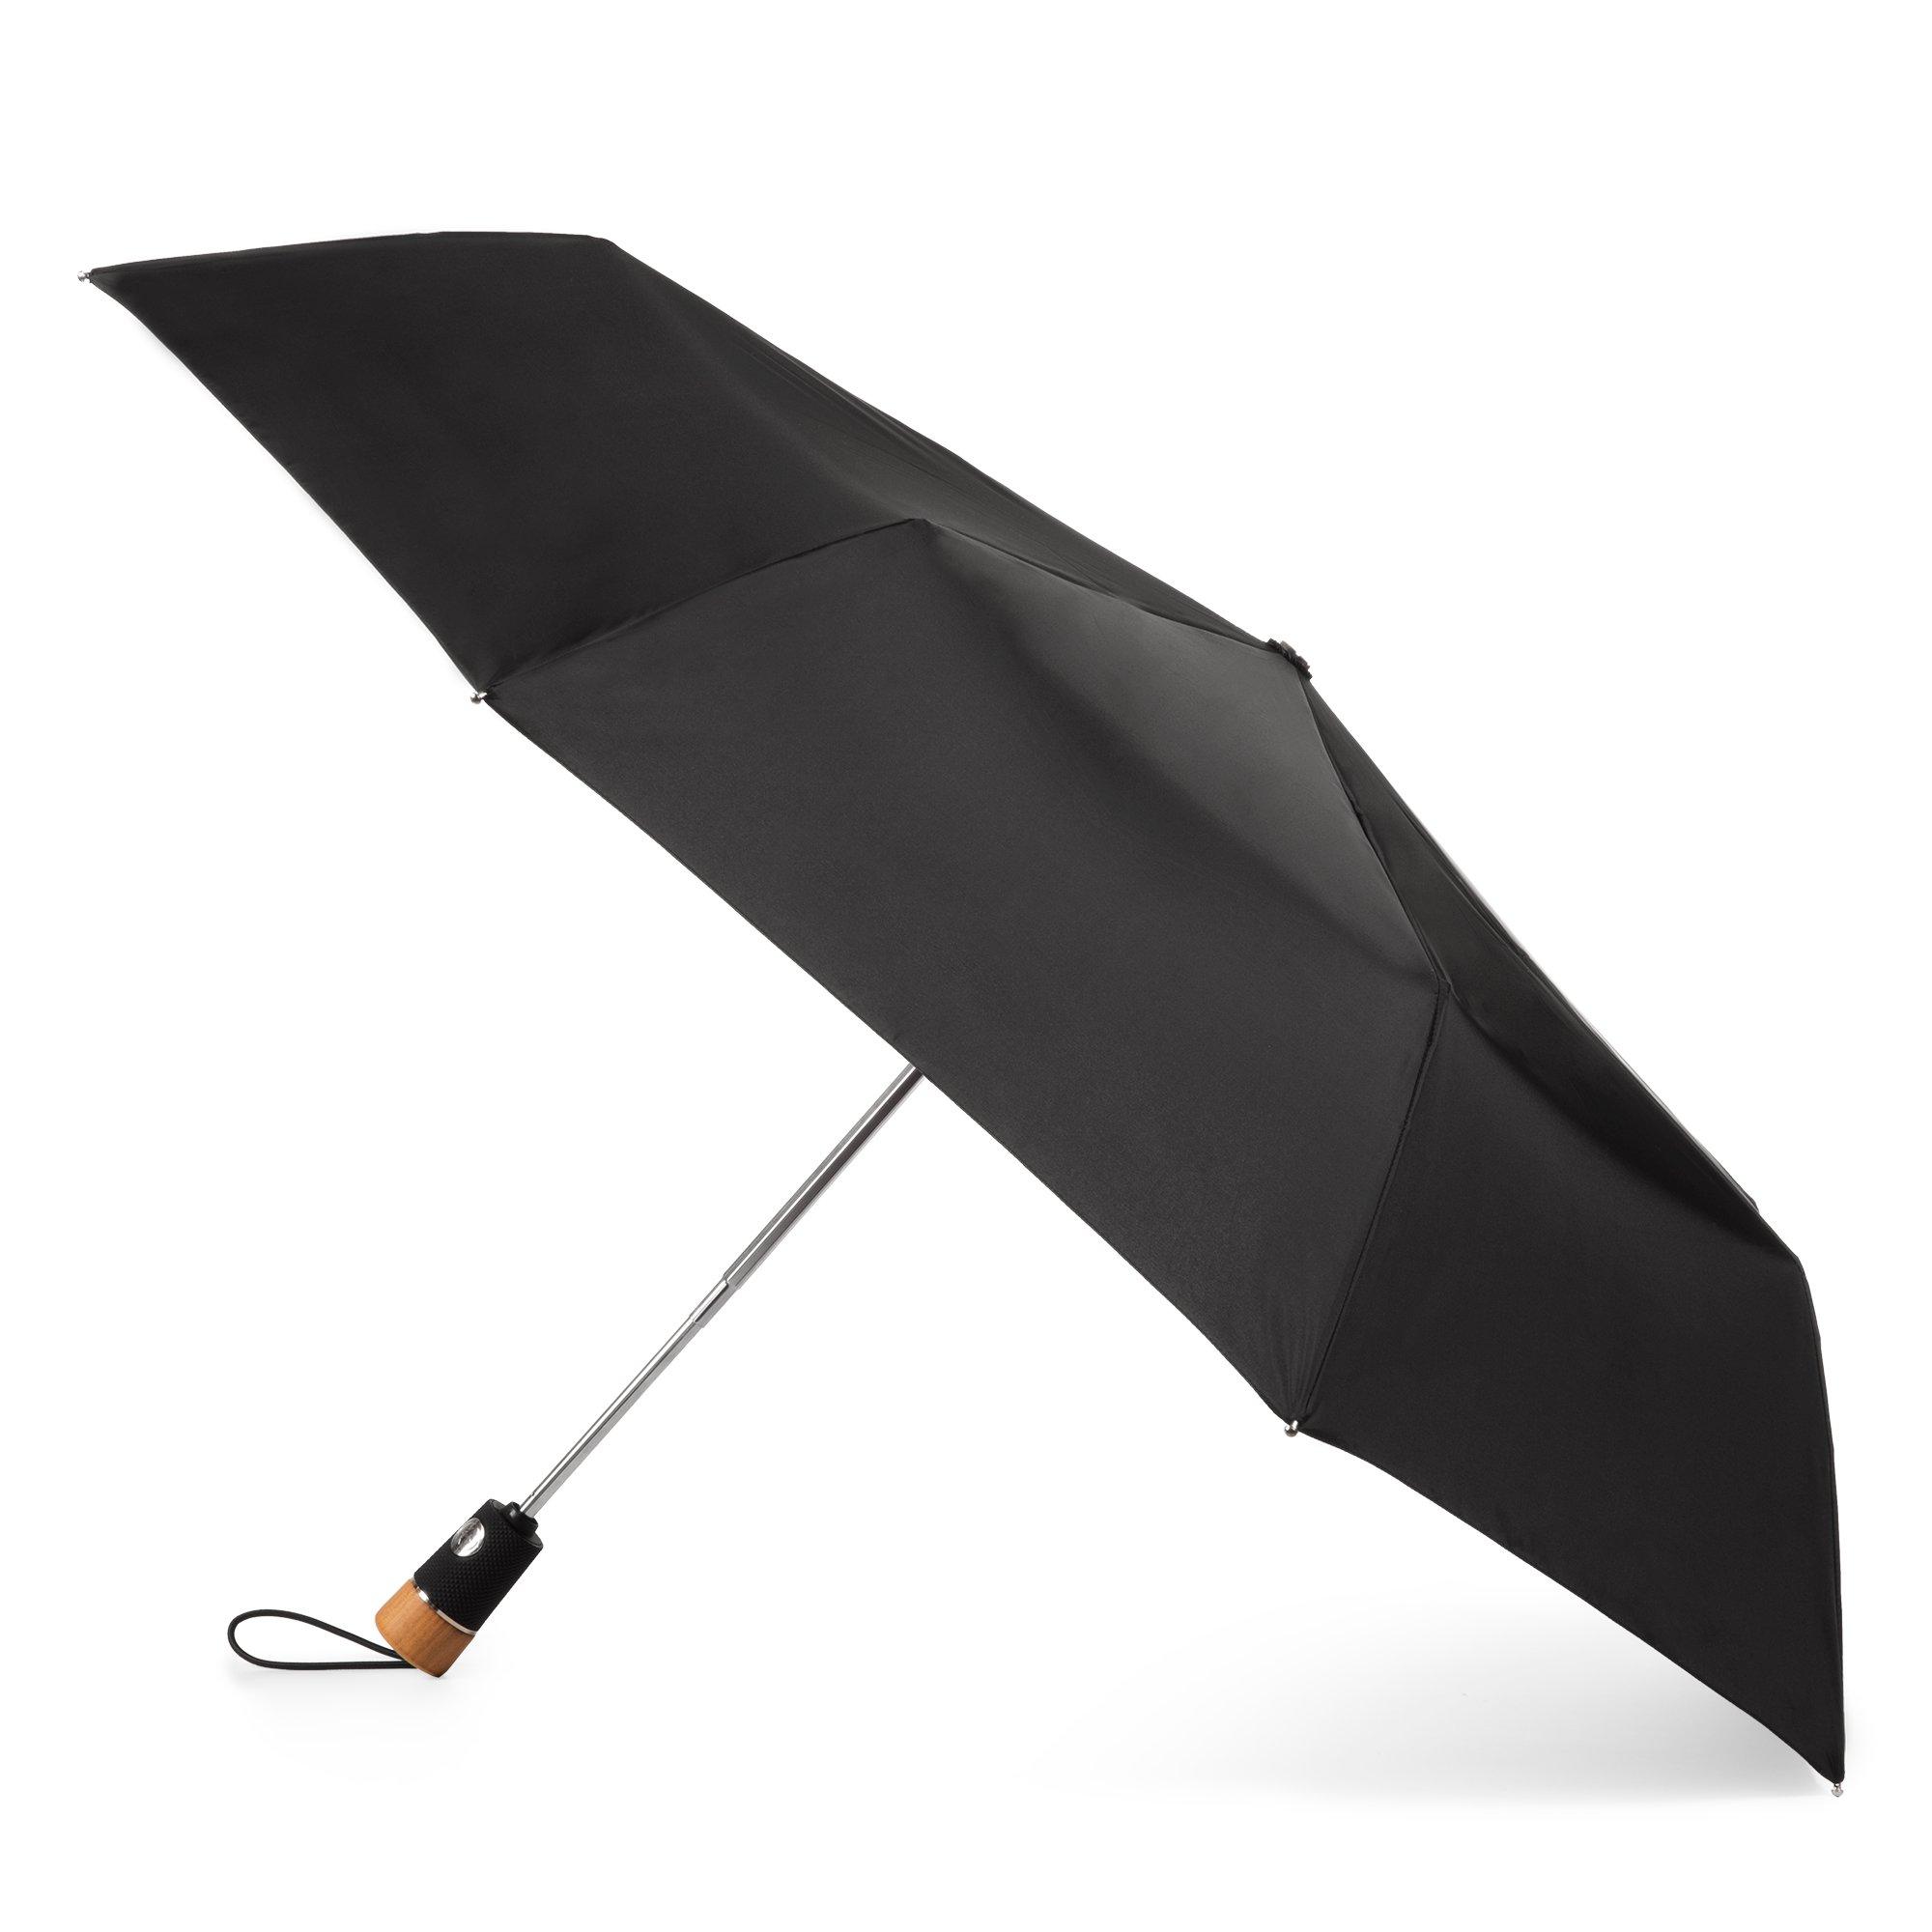 Titan Automatic Open Close Windproof Water-Resistant Foldable Umbrella